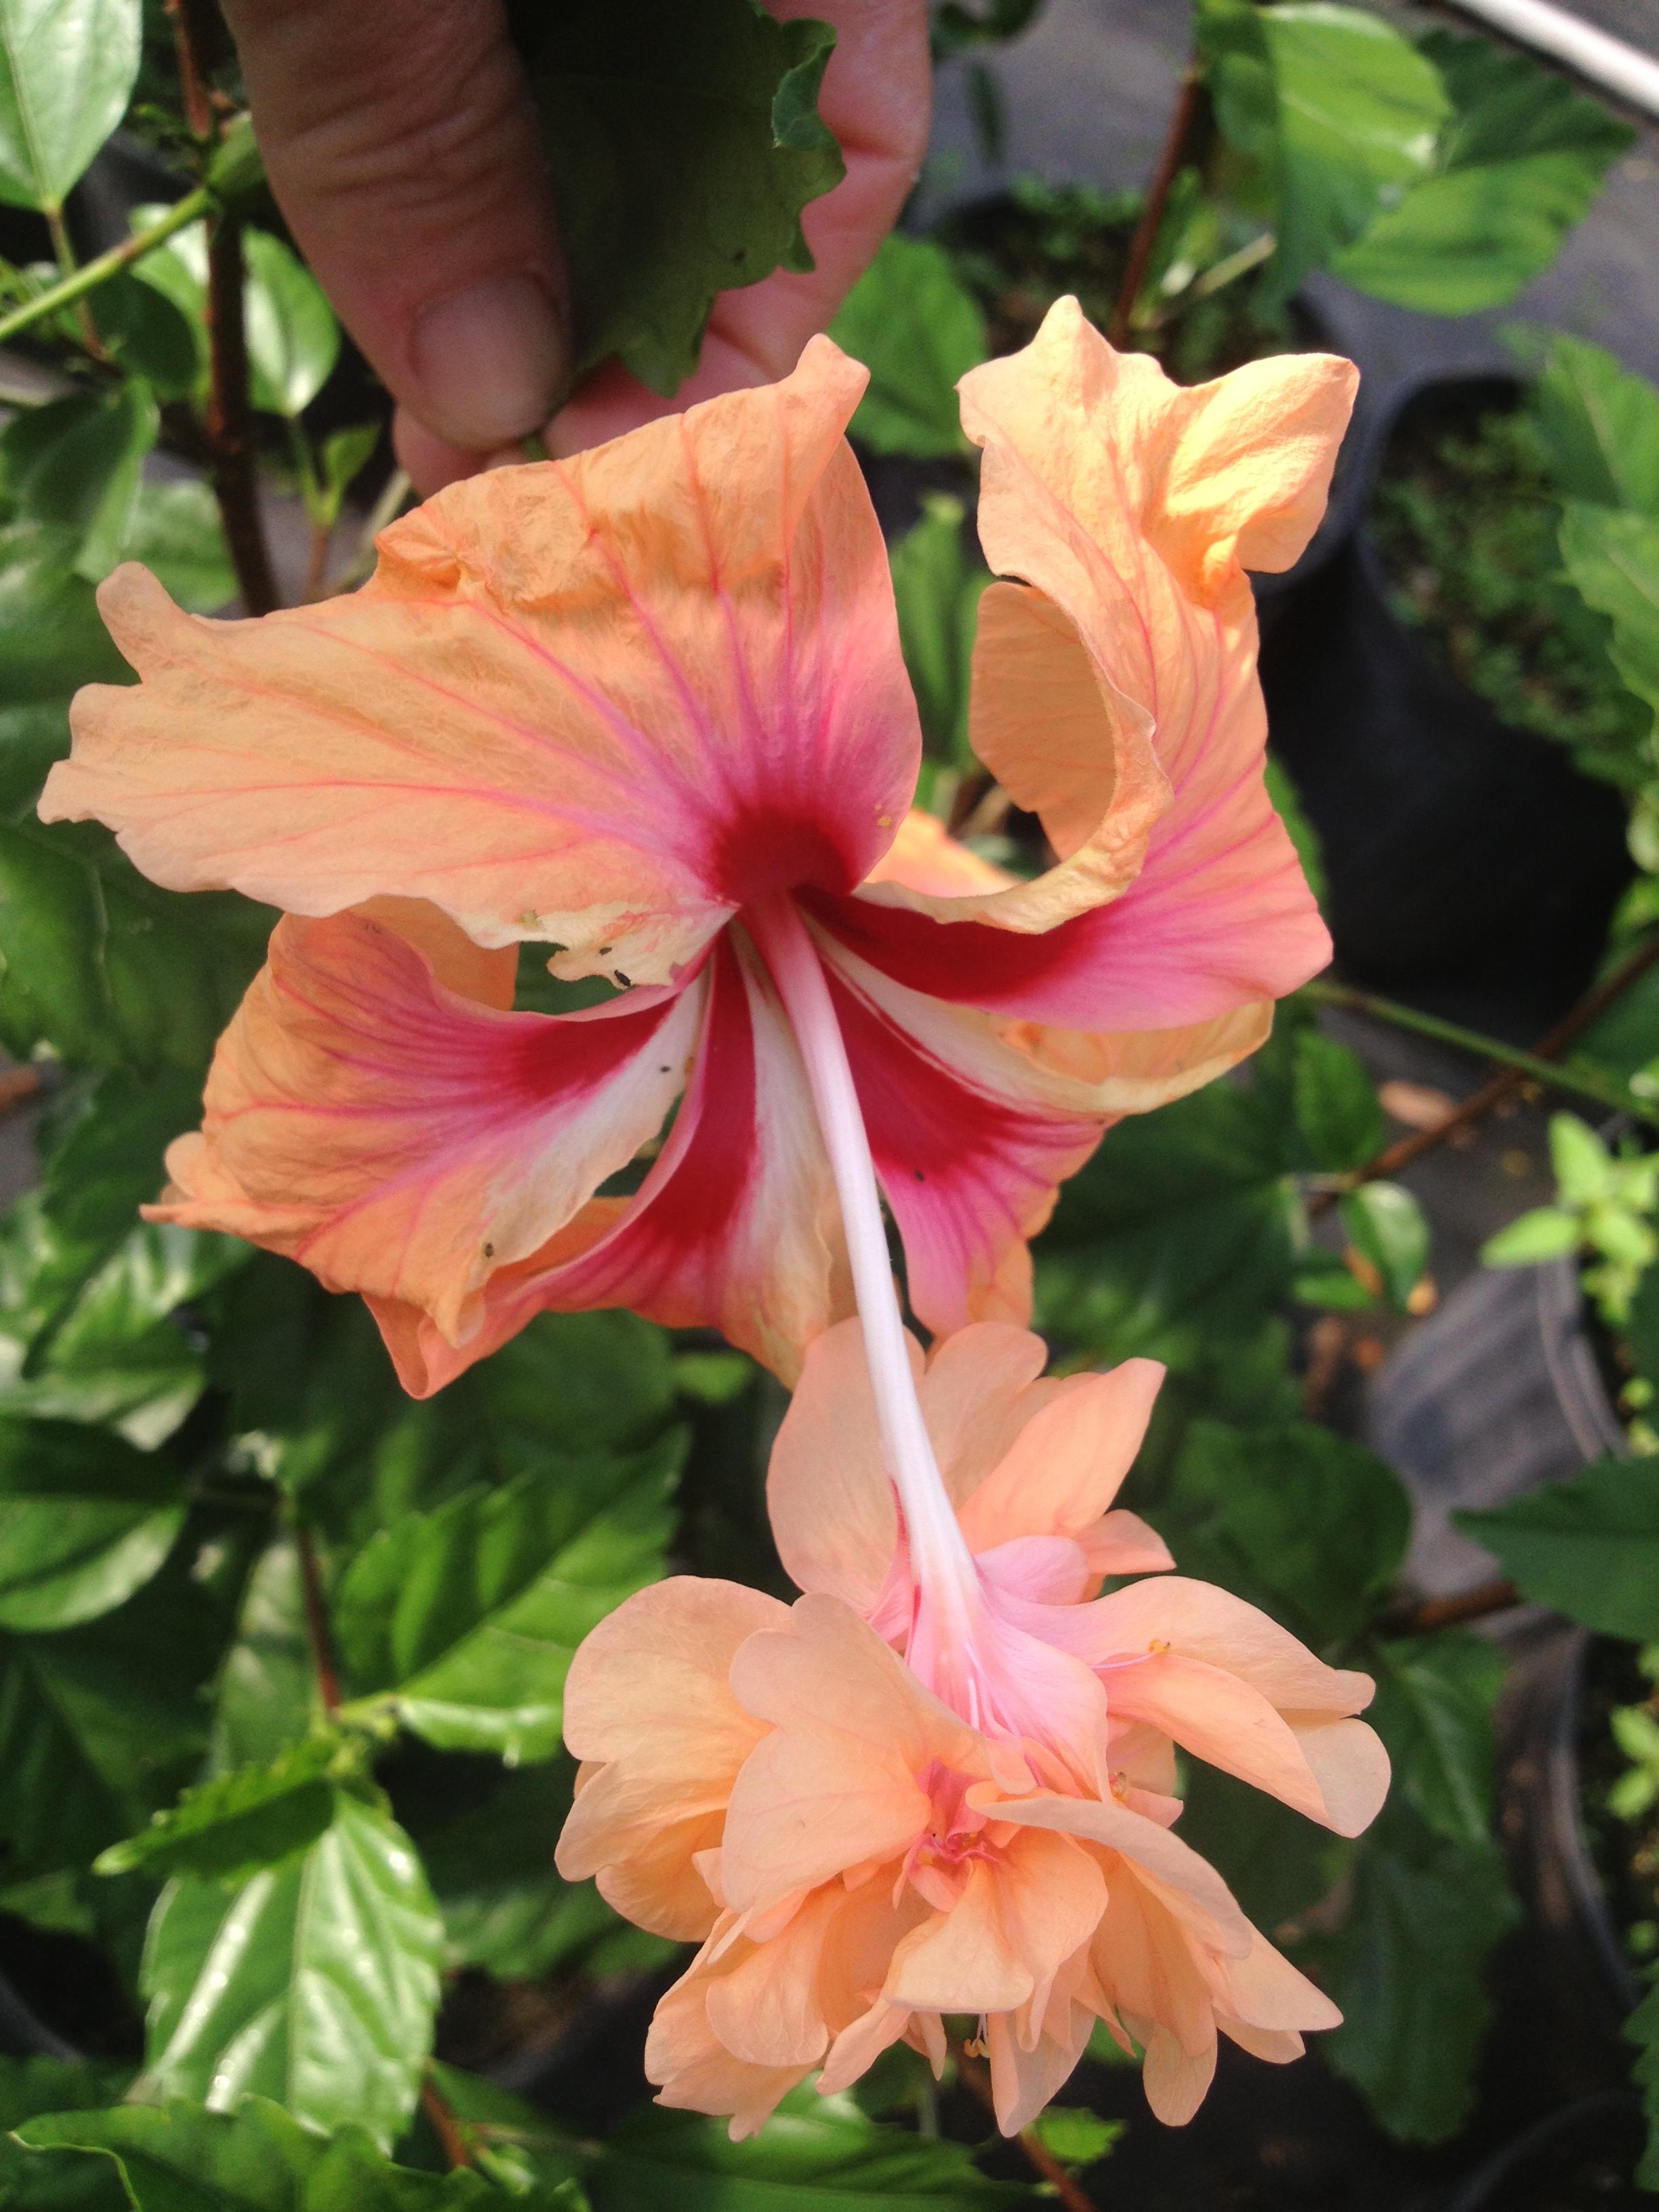 Peach Orange Lions Tail Tropical Hibiscus Live Plant Rare Unusual